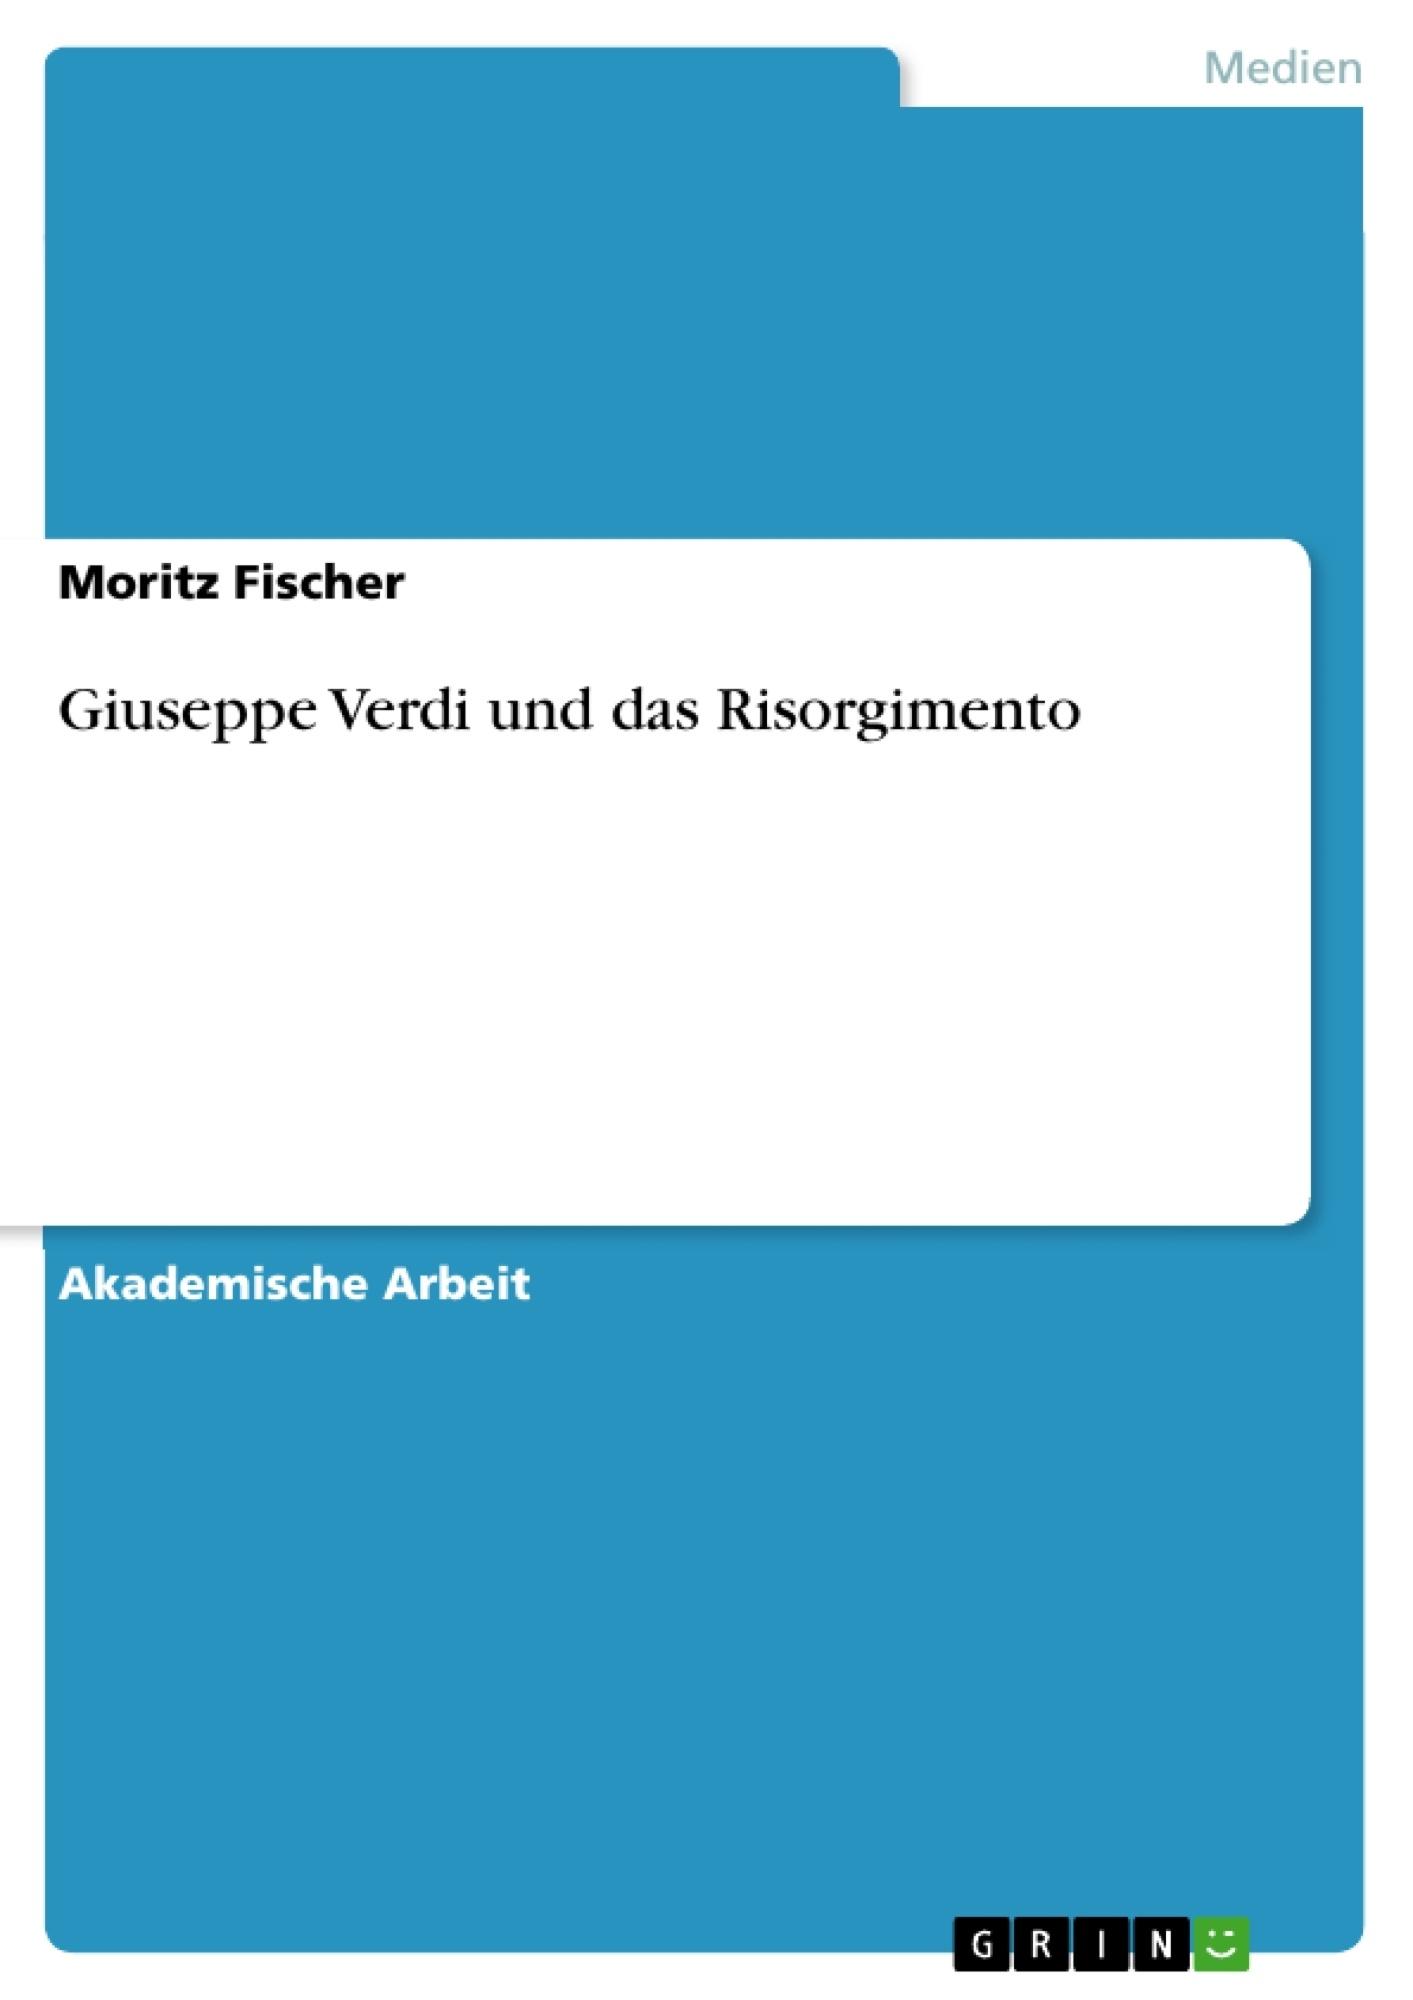 Titel: Giuseppe Verdi und das Risorgimento